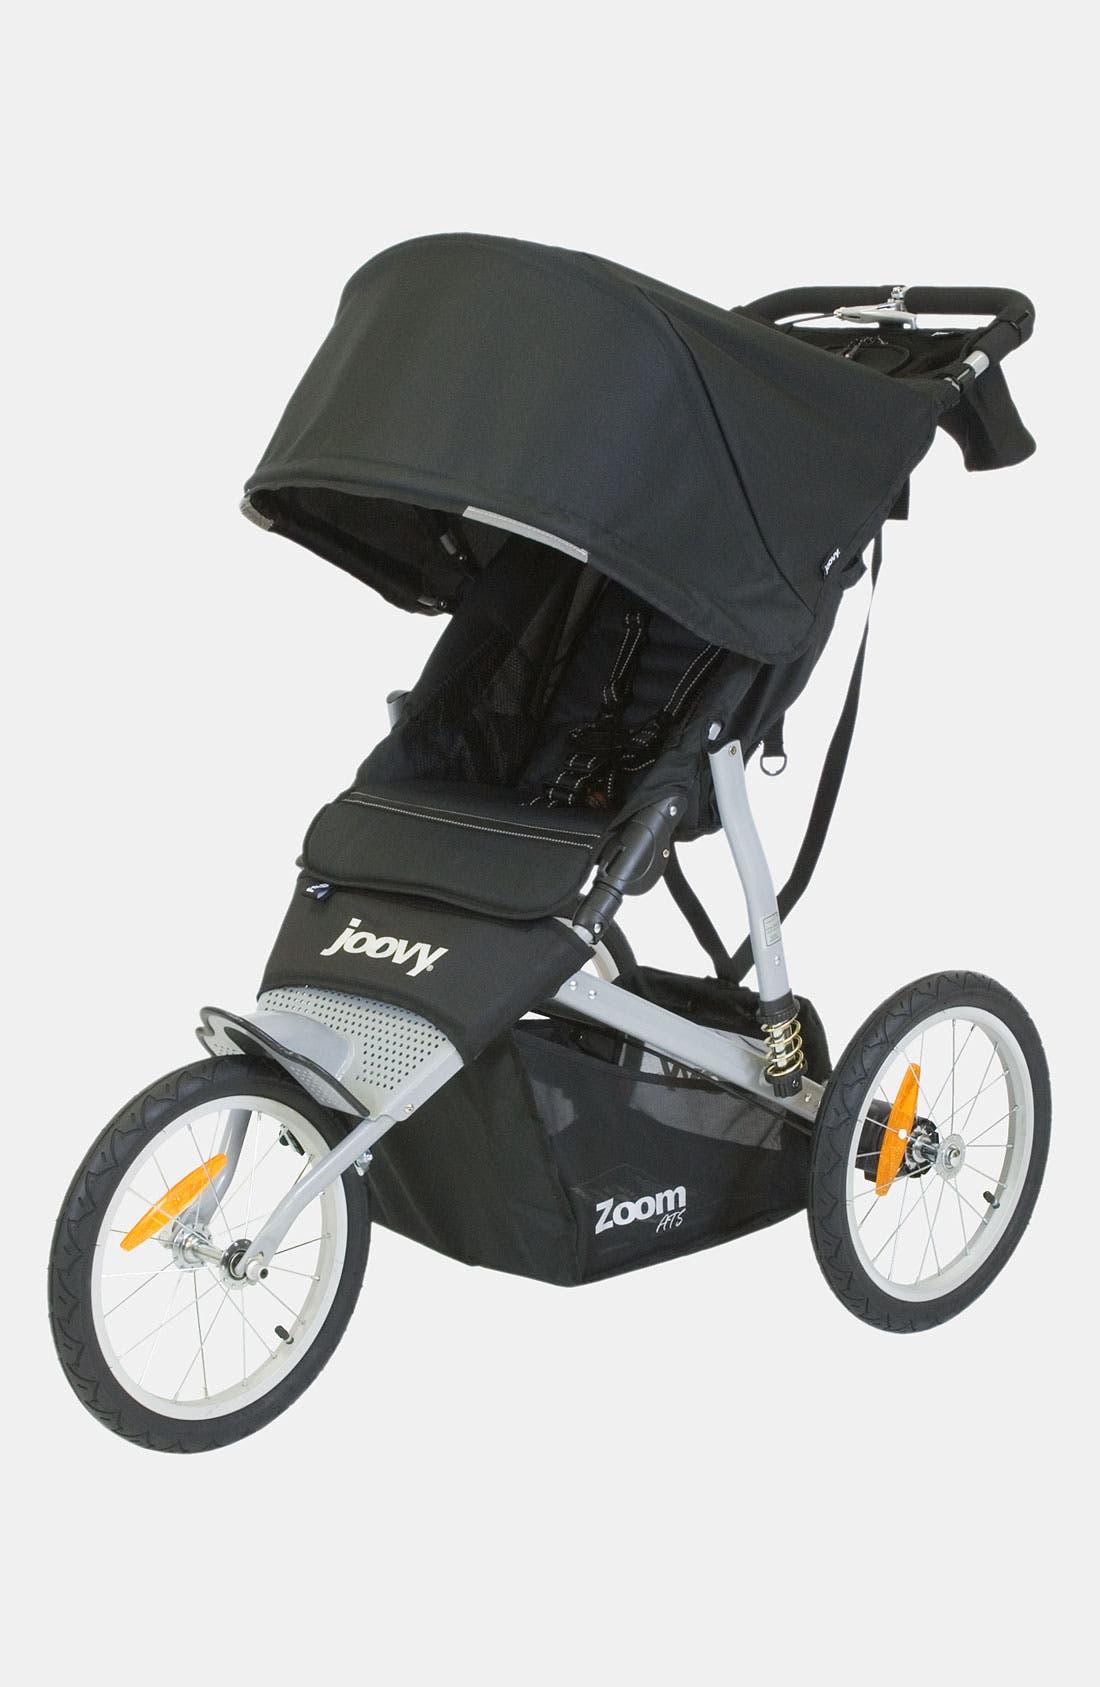 Main Image - Joovy 'Zoom ATS' Jogging Stroller